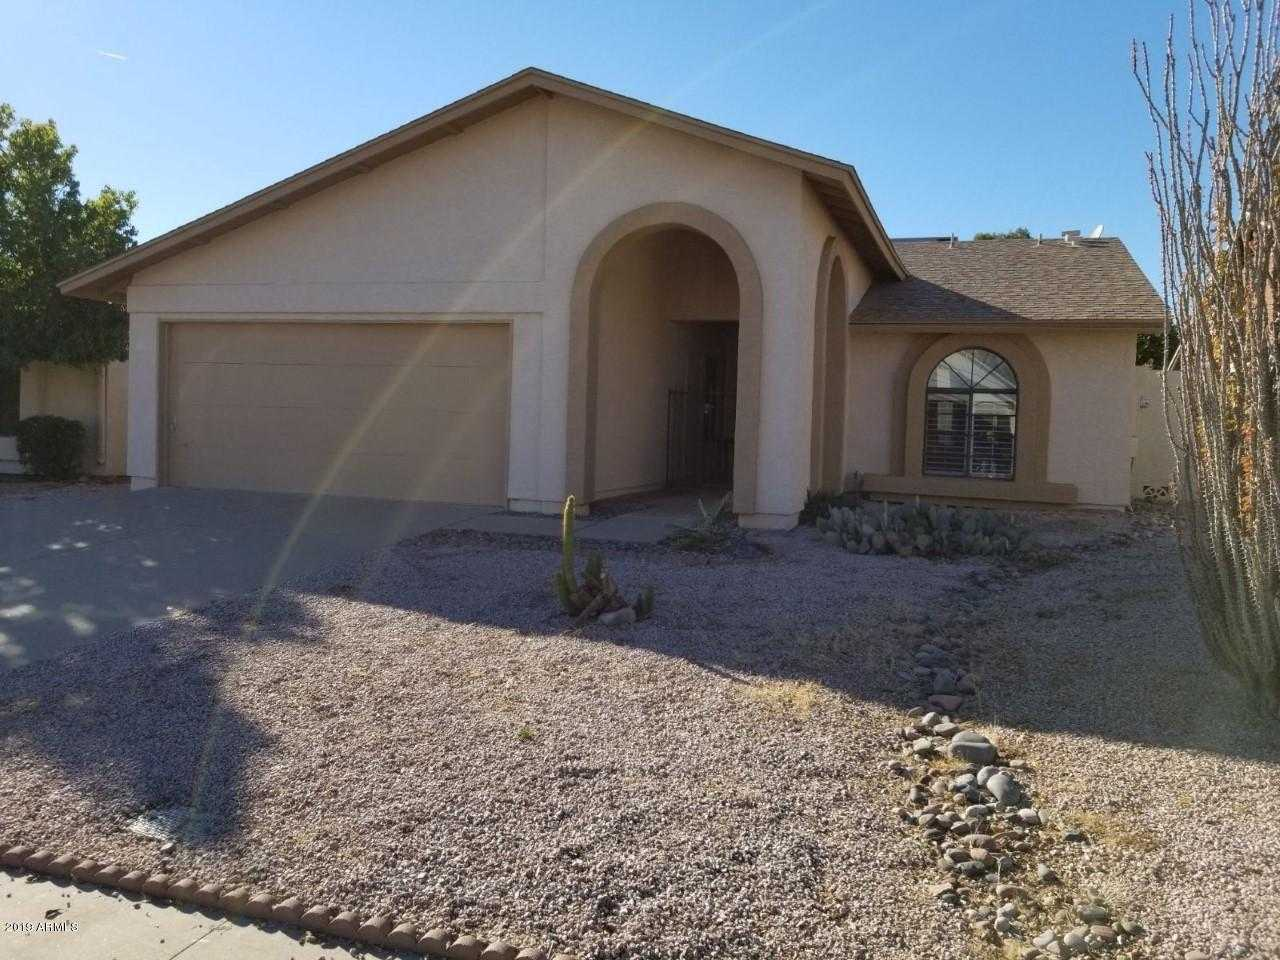 $329,997 - 2Br/2Ba - Home for Sale in Trails At Scottsdale 2 Lot 173-289 & Tr I,j, & O-q, Scottsdale